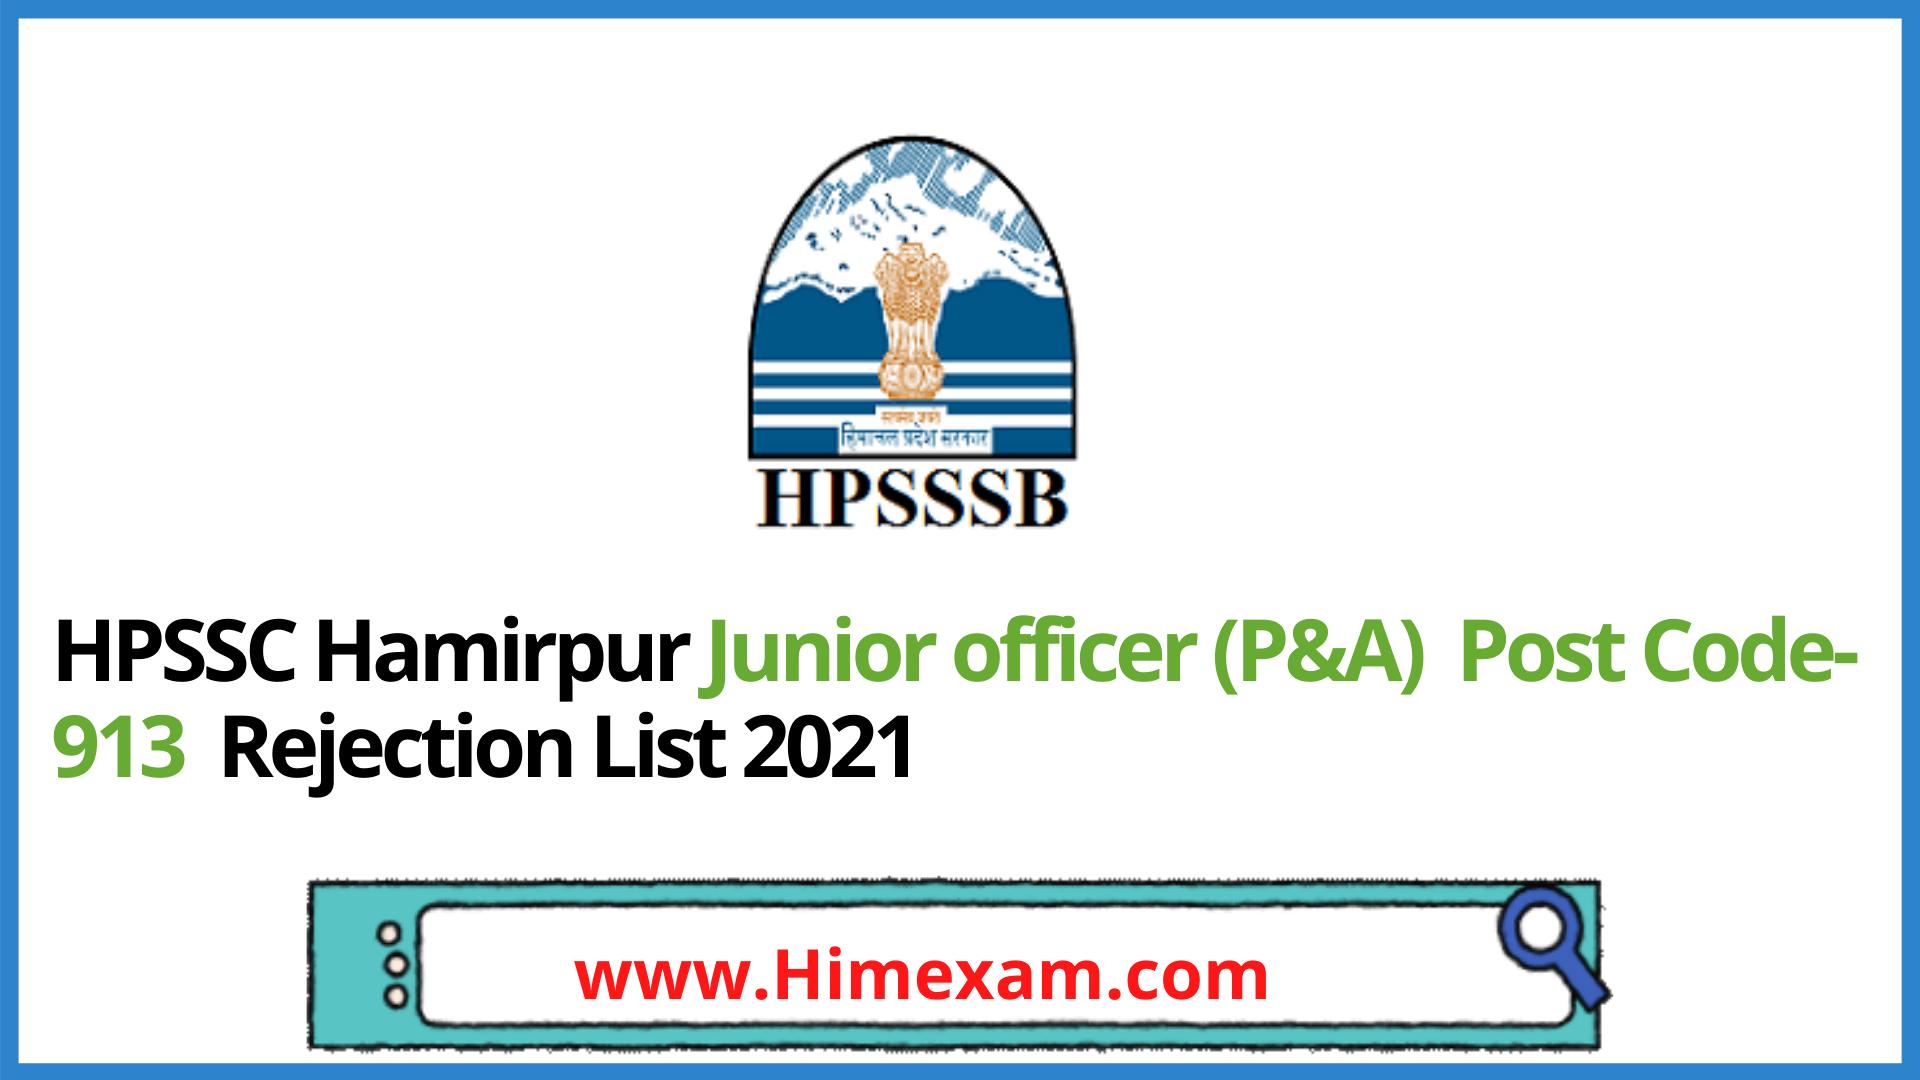 HPSSC Hamirpur Junior officer (P&A)  Post Code-913 Rejection List 2021